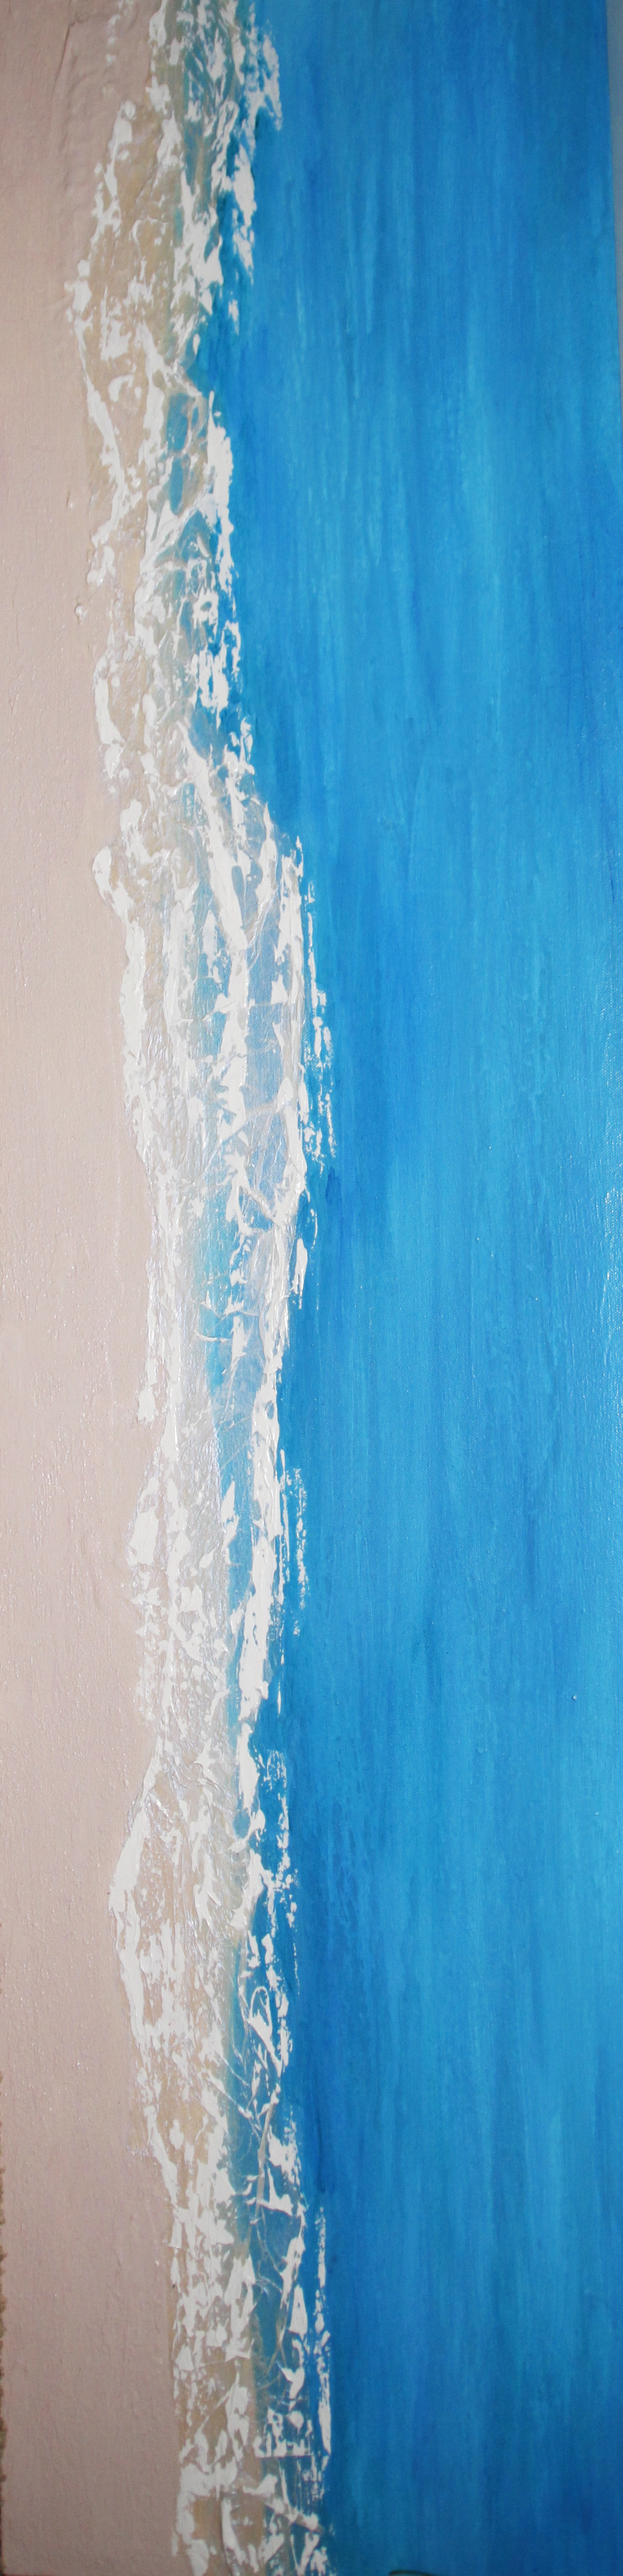 Blue Margin 305016